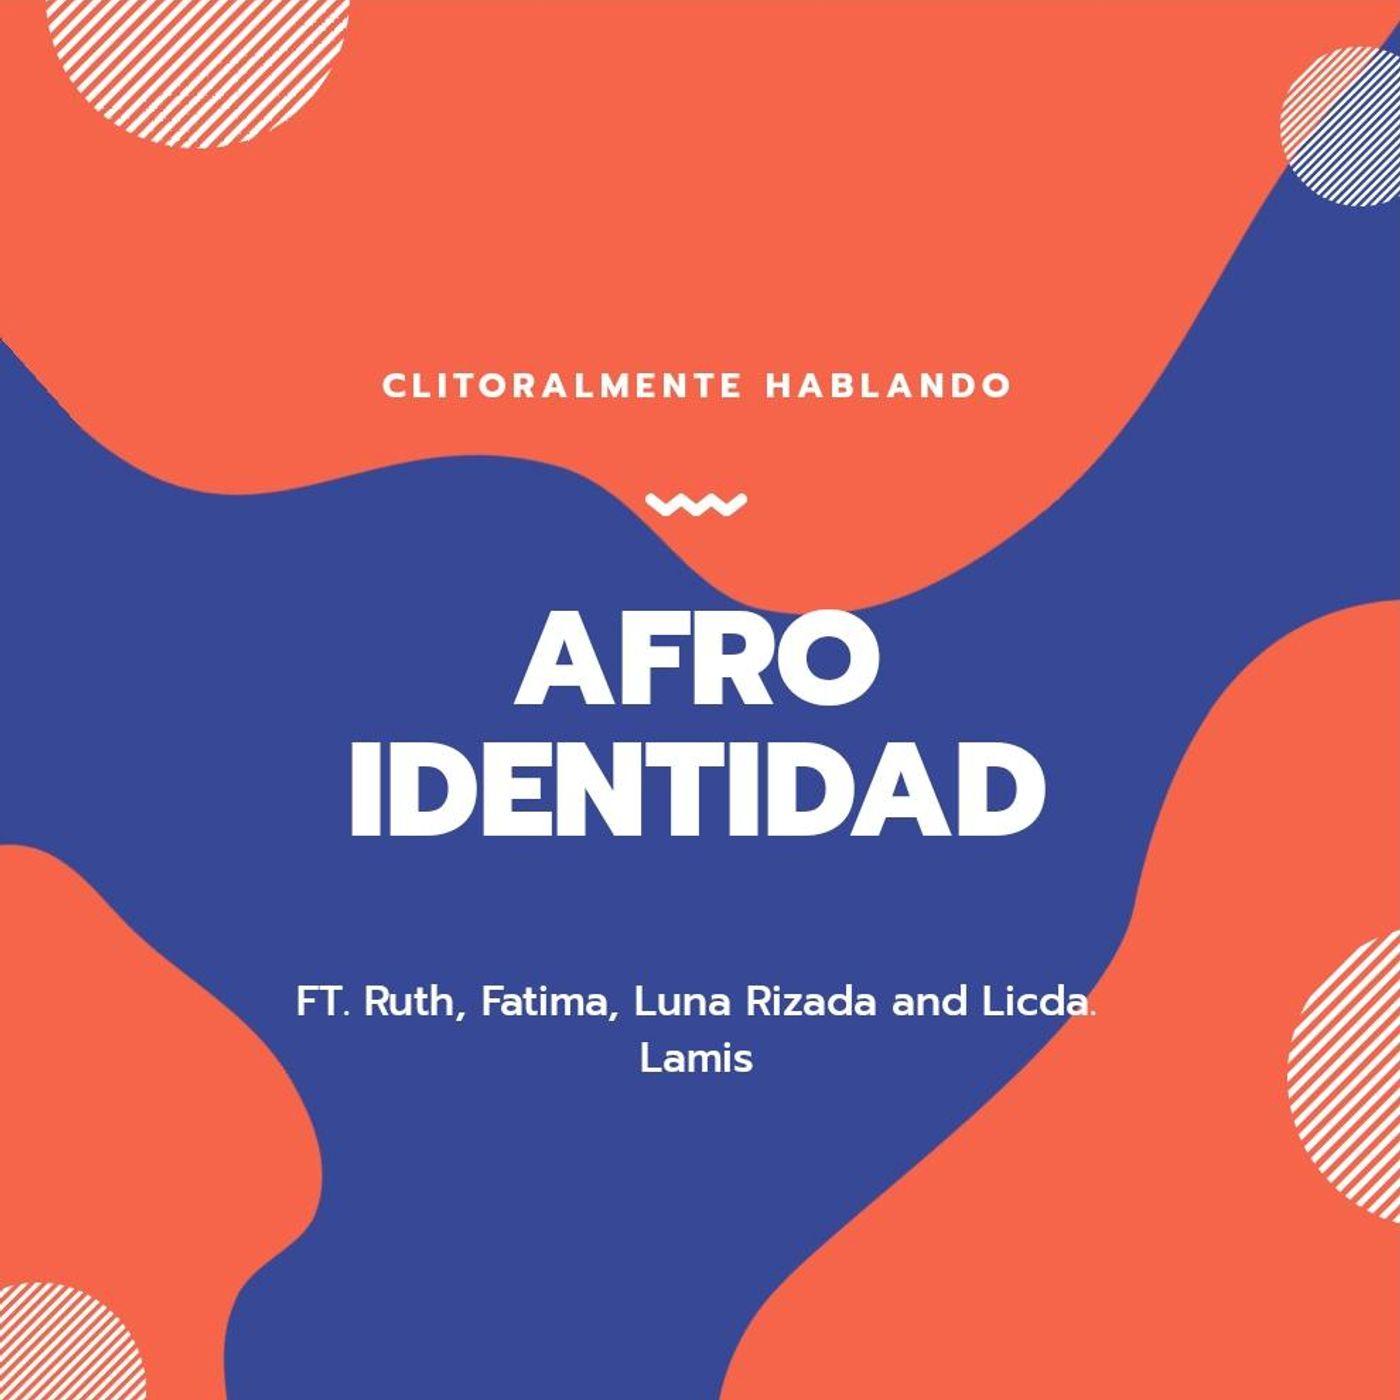 Afro Identidad FT Ruth, Fátima, Luna Rizada y Lic. Lamia